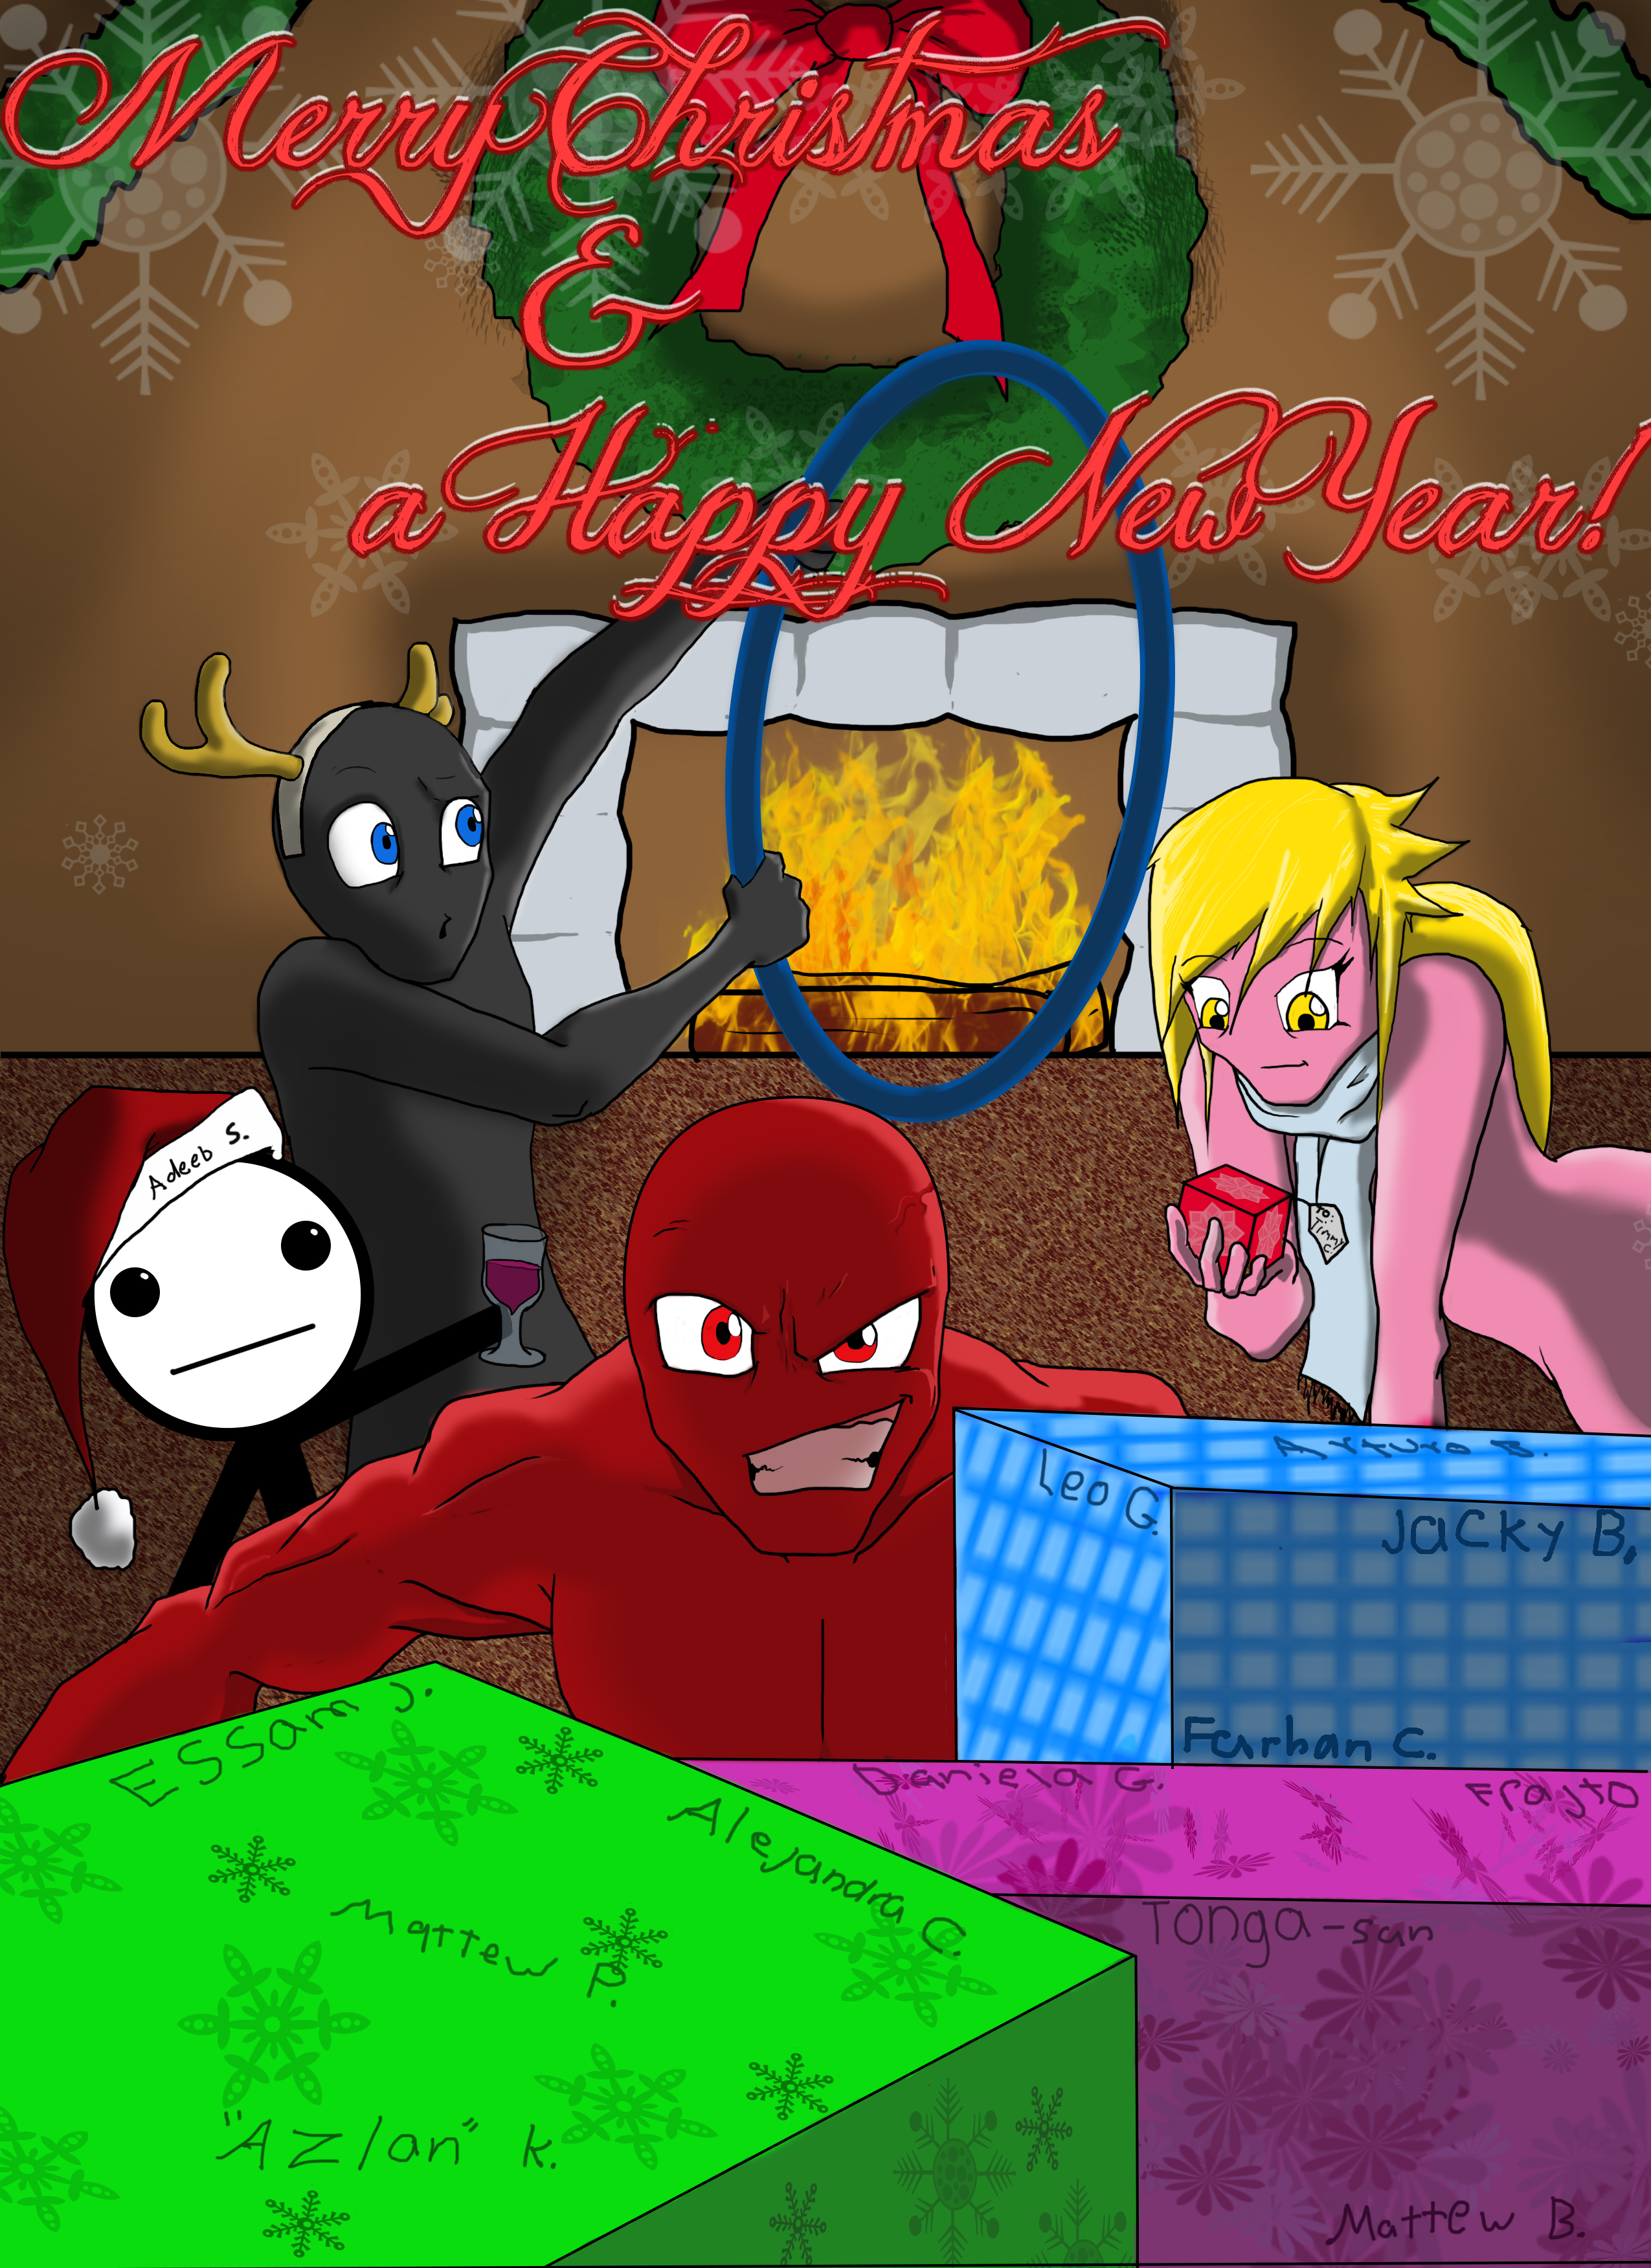 Merry Christmas! 2013